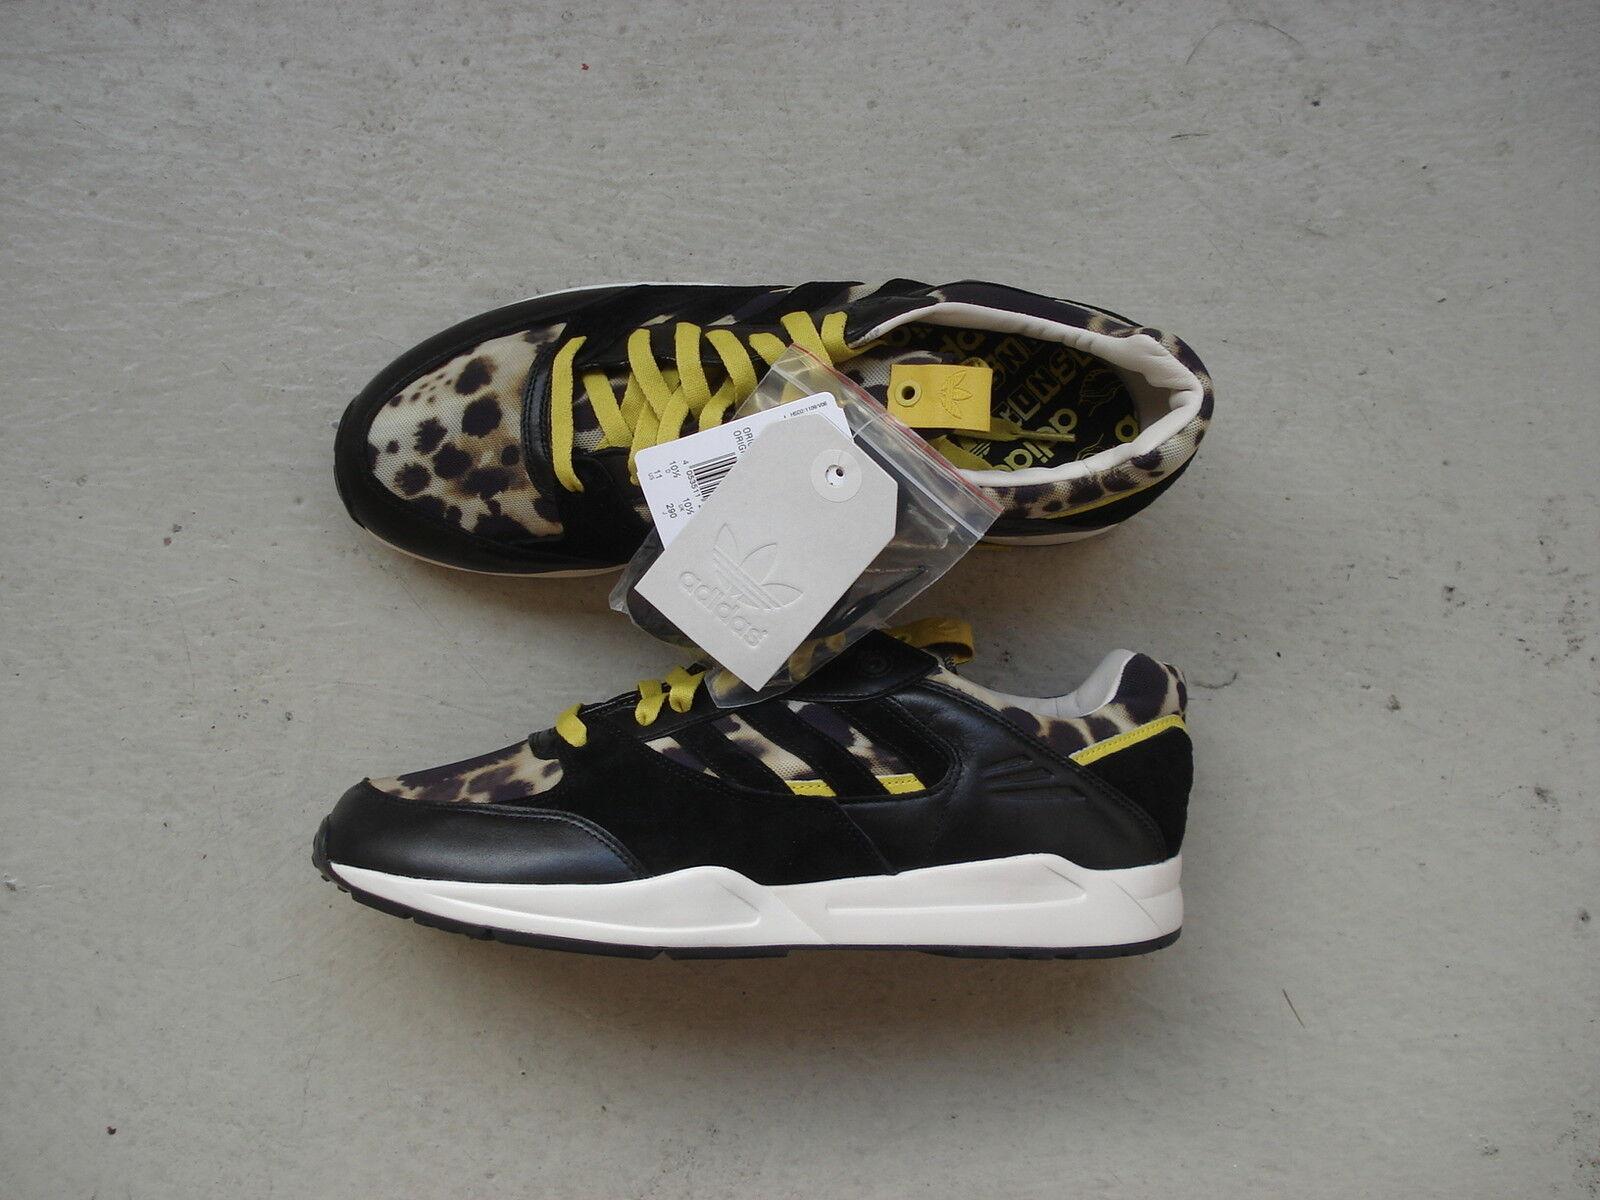 Adidas Tech Super 45 1 3 WCAP Consortium Originals Black1 Chalk2 Super Yellow